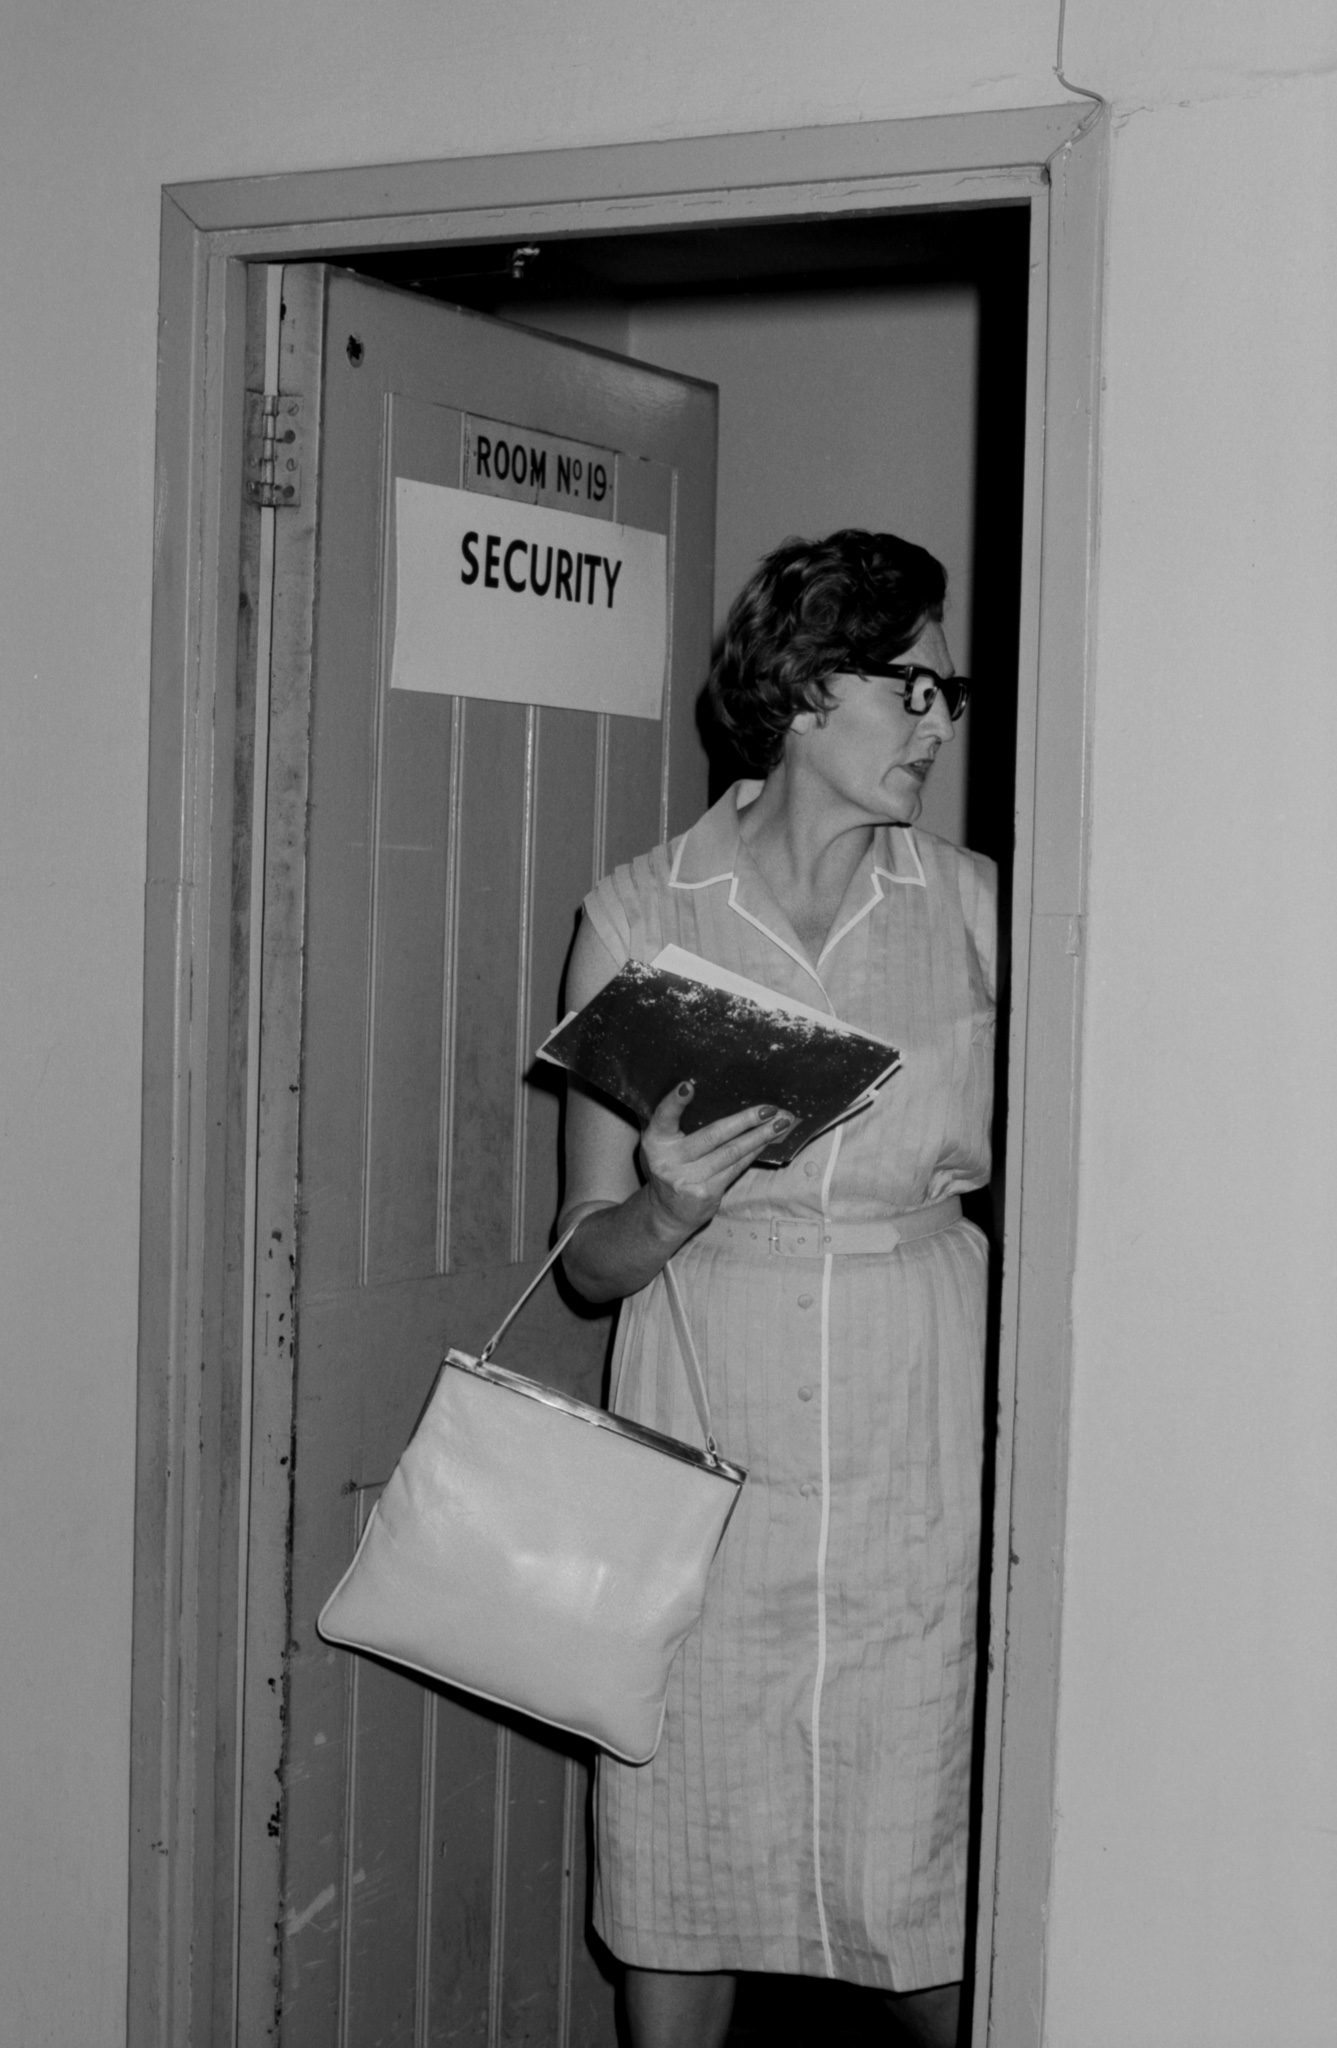 Room 19 Security